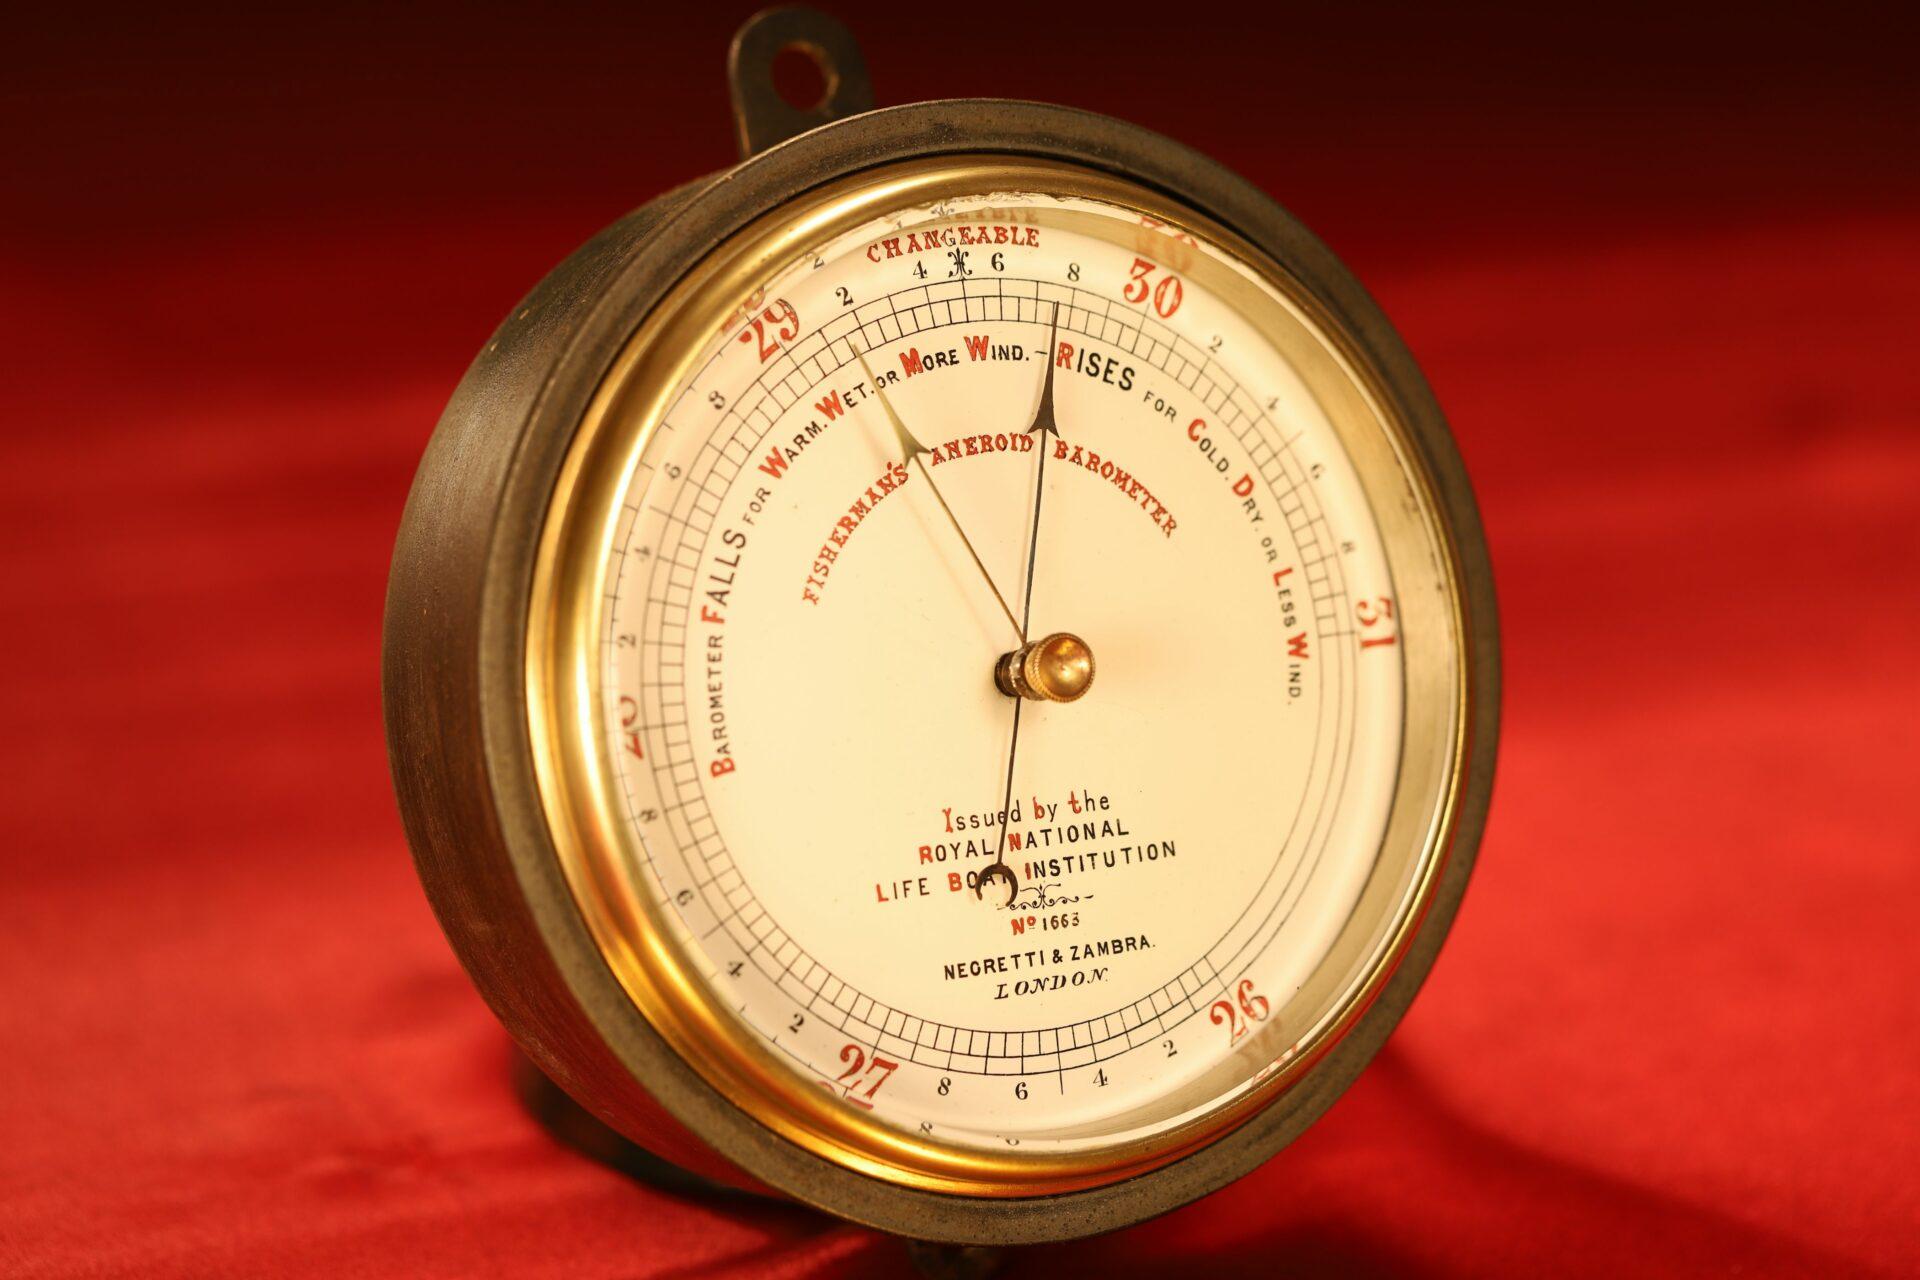 Image of Negretti & Zambra RNLI Fishermans Aneroid Barometer No 1663 taken from lefthand side